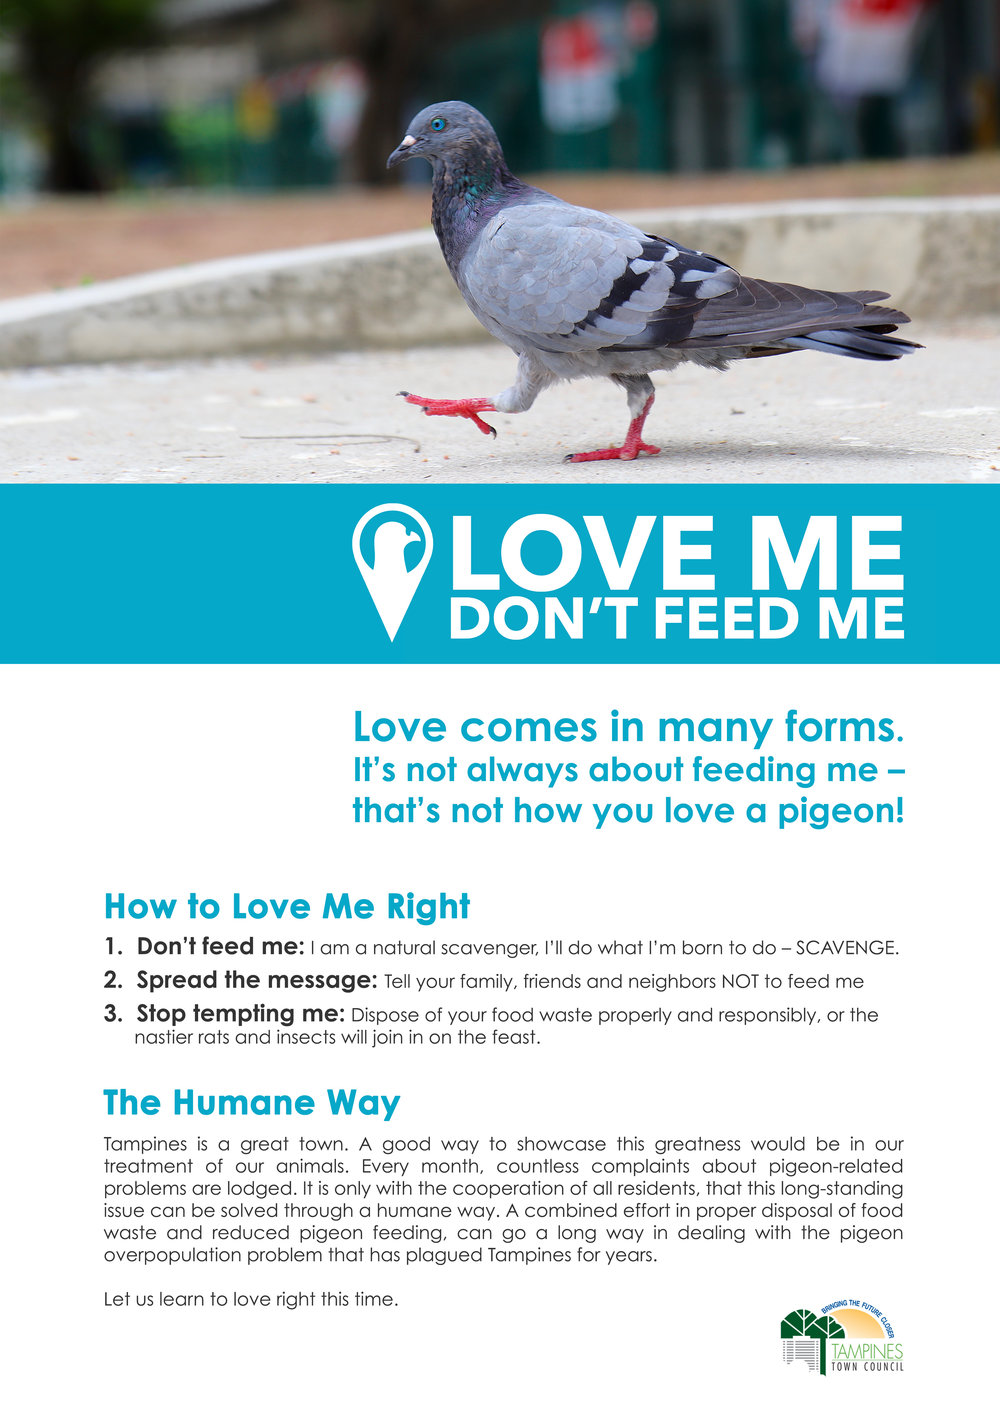 pigeon poster 1.jpg